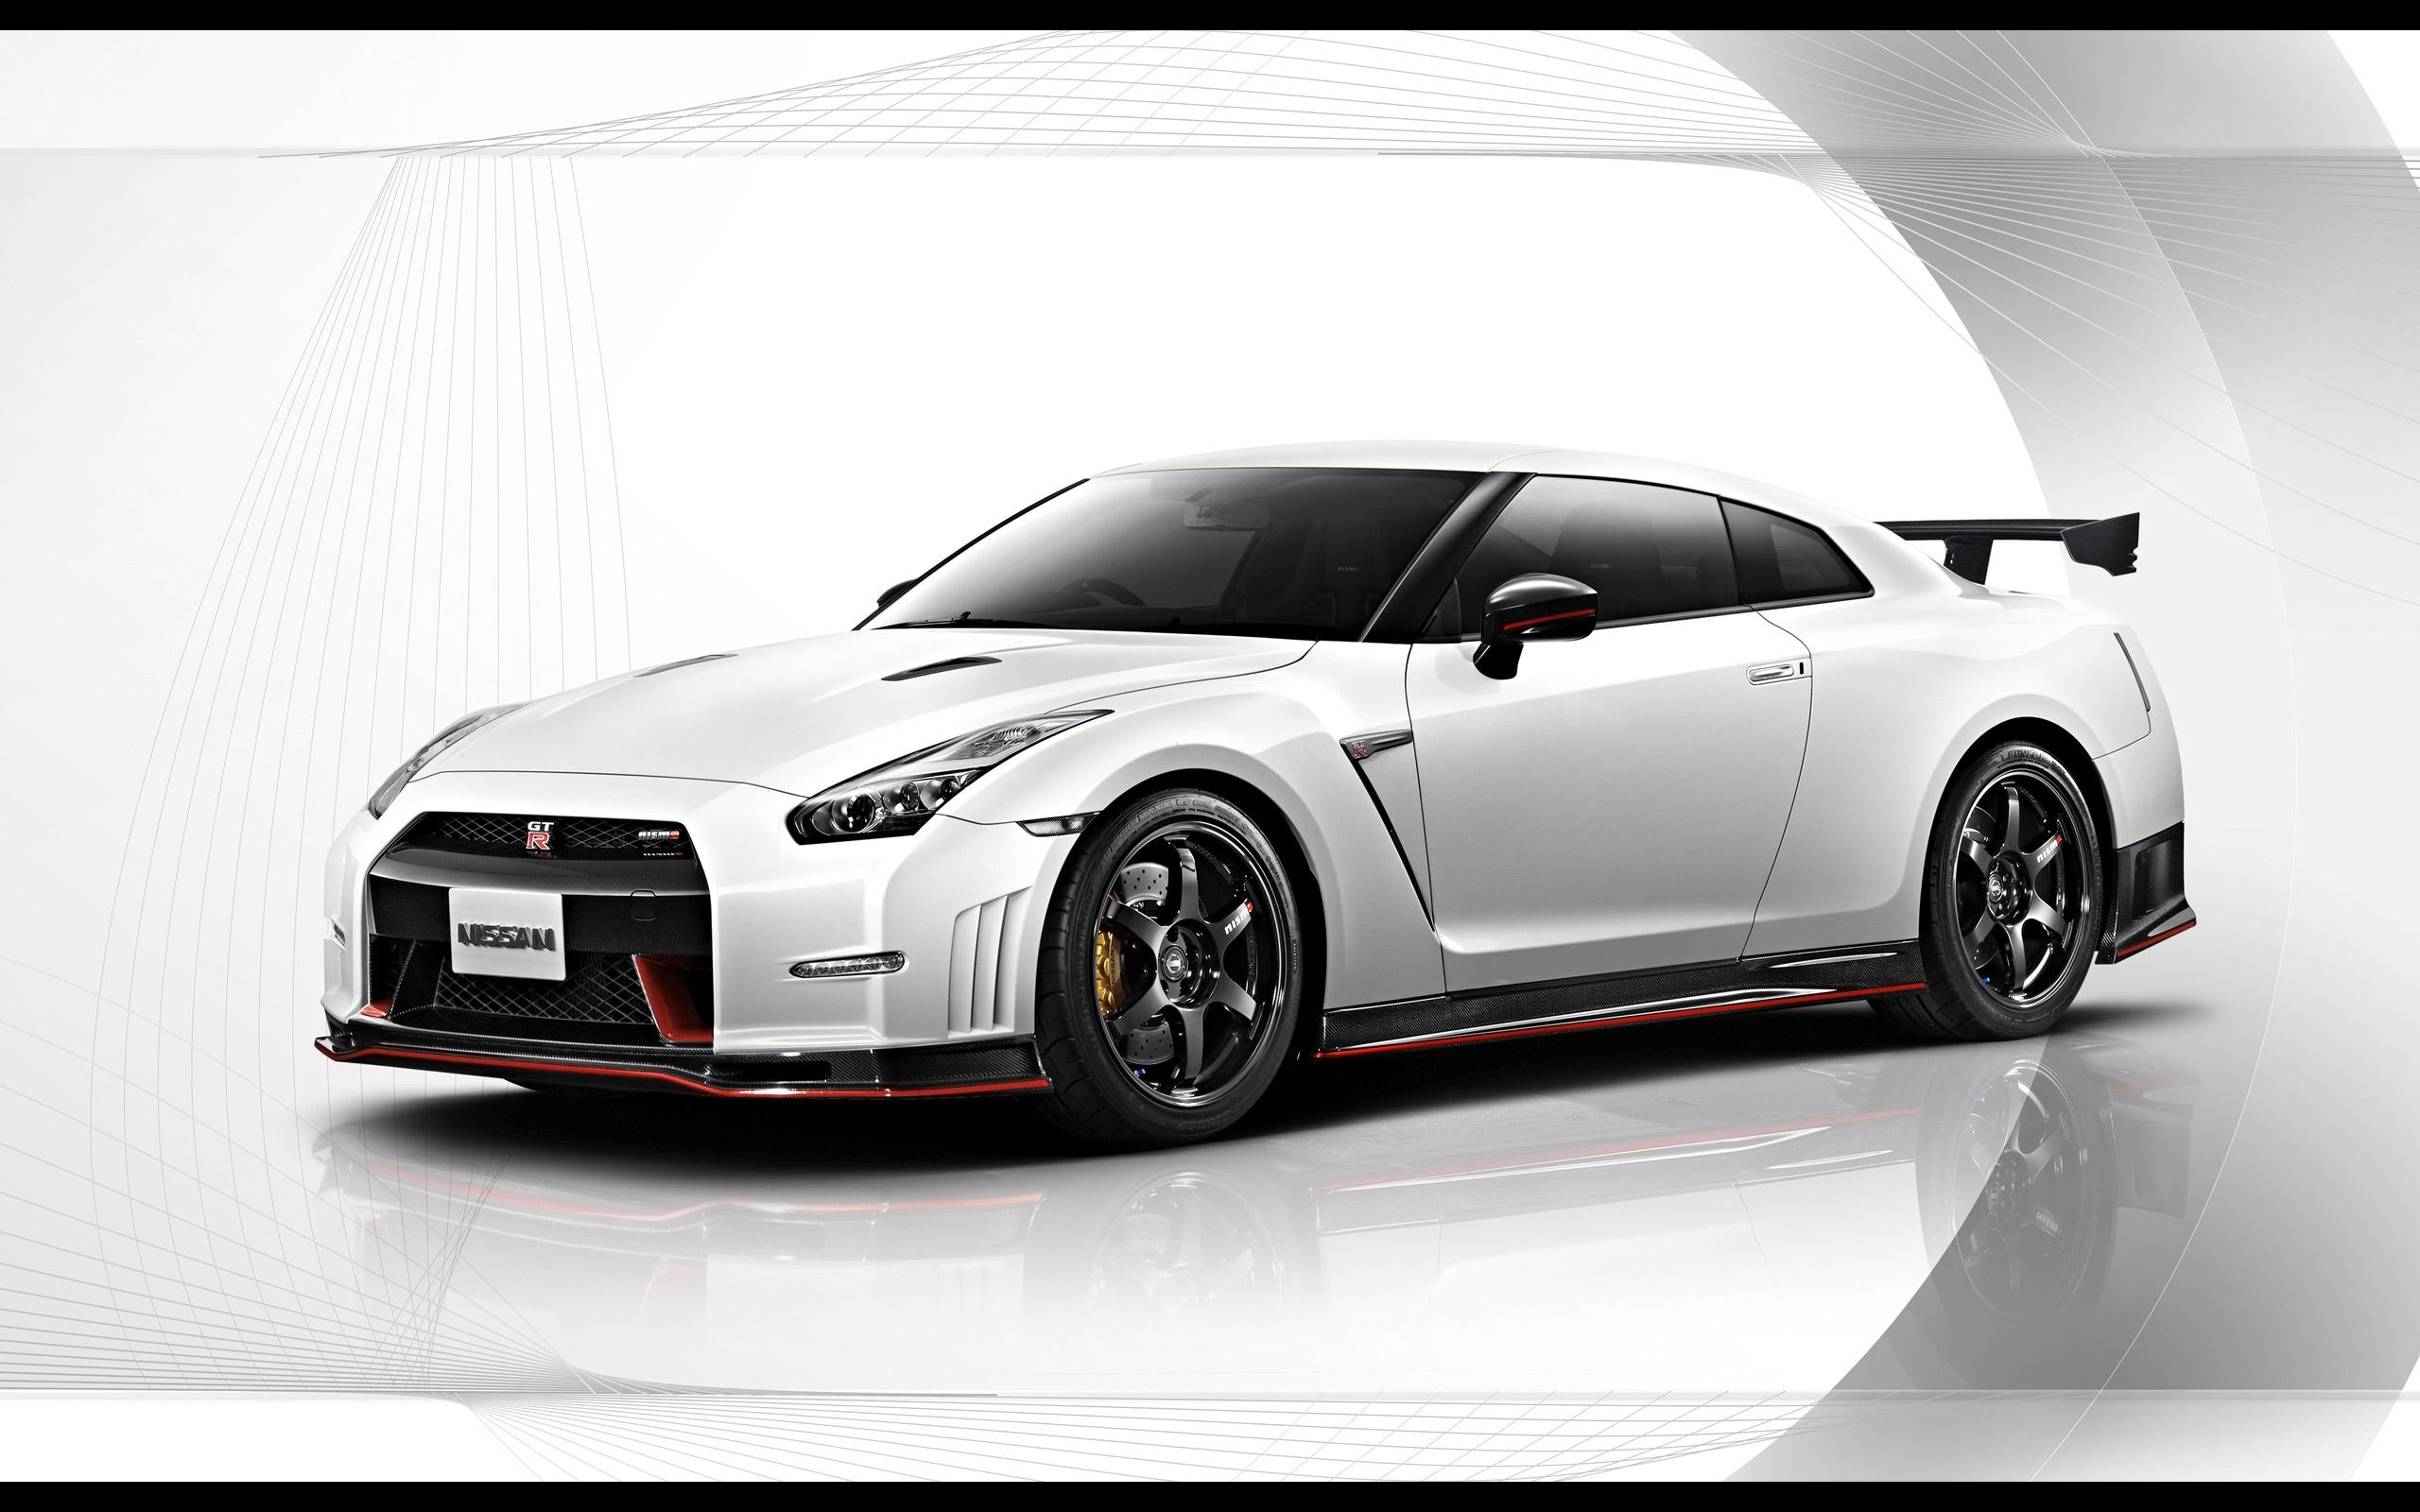 2015 Nissan GT R NISMO 2 Wallpaper HD Car Wallpapers 2560x1600